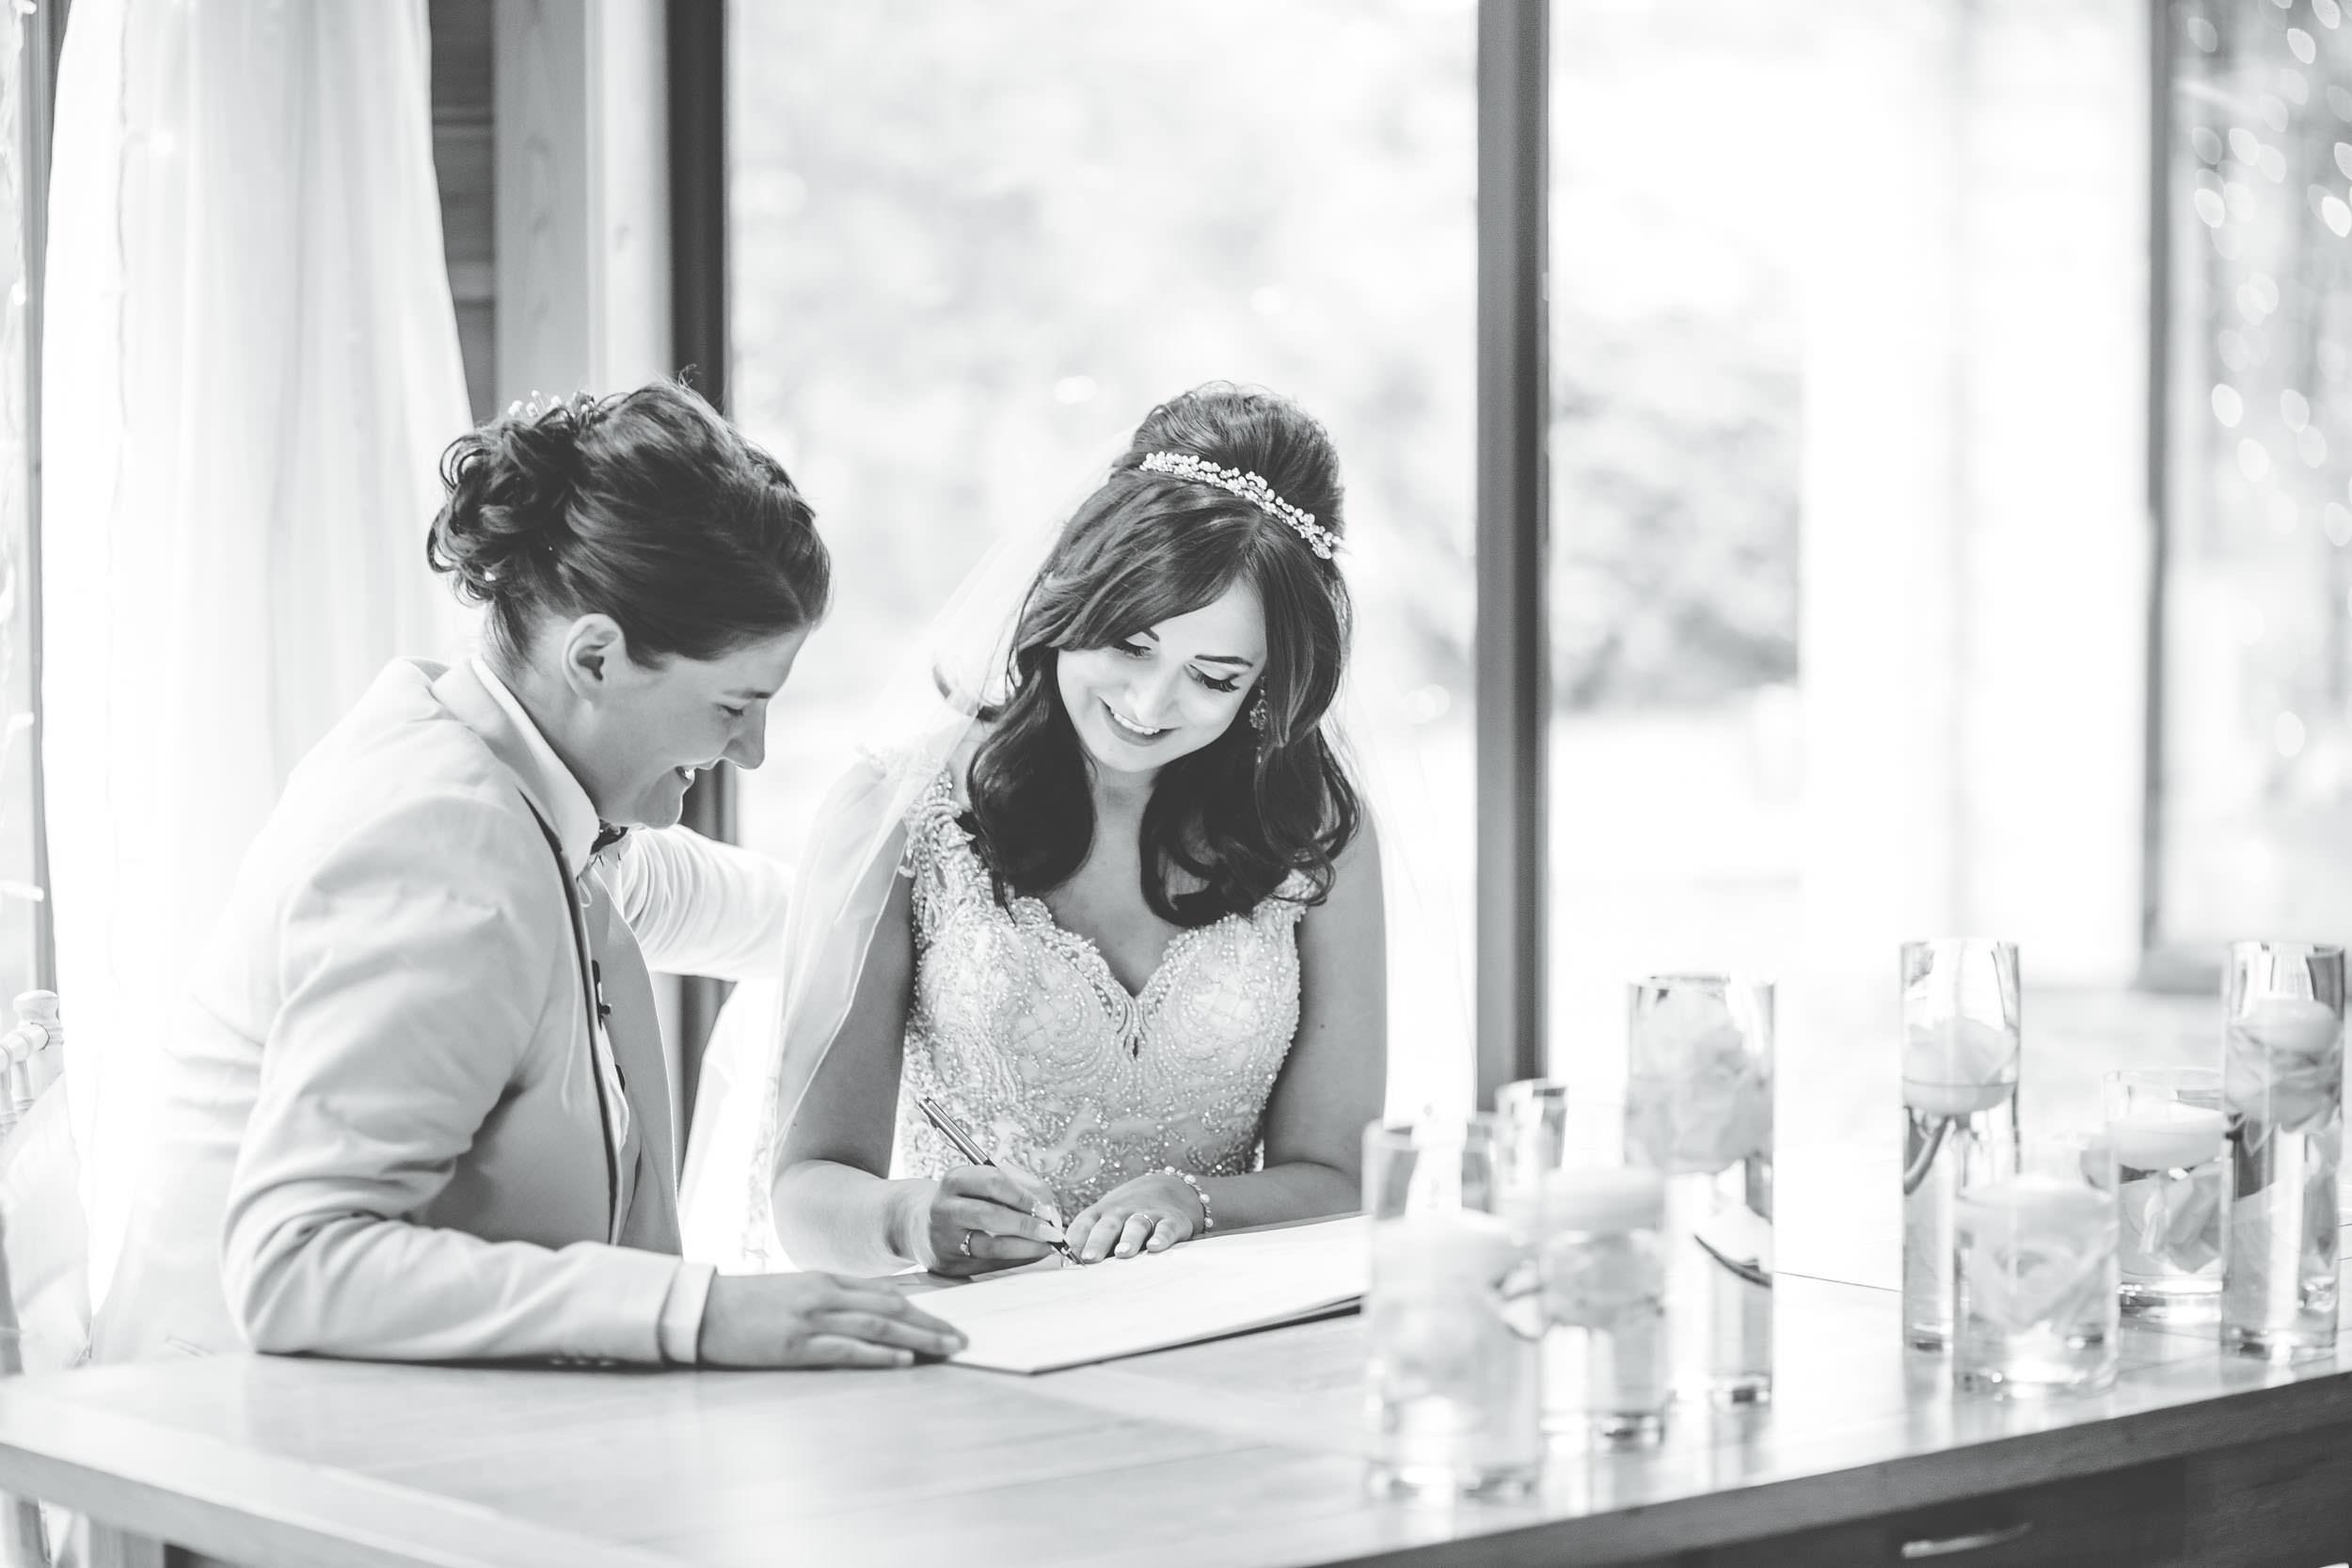 beautiful documentary wedding images - same sex wedding photographer cheshire